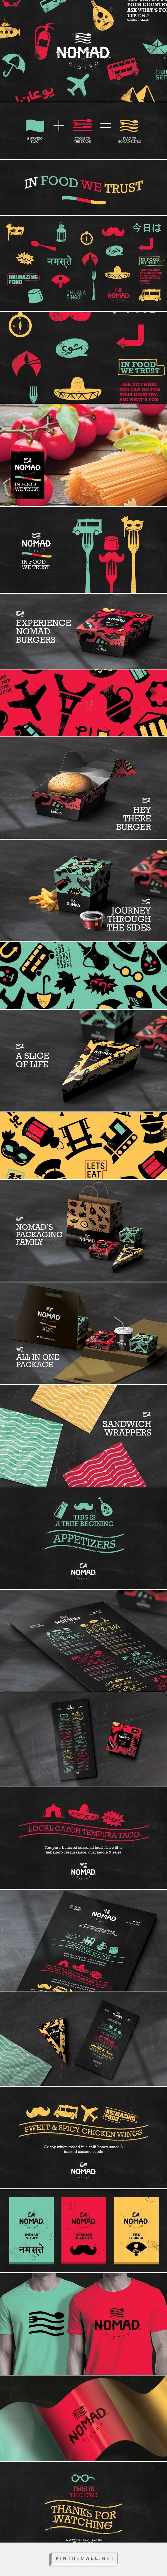 Nomad Bistro Branding by Studio AIO on Behance | Fivestar Branding – Design and… More